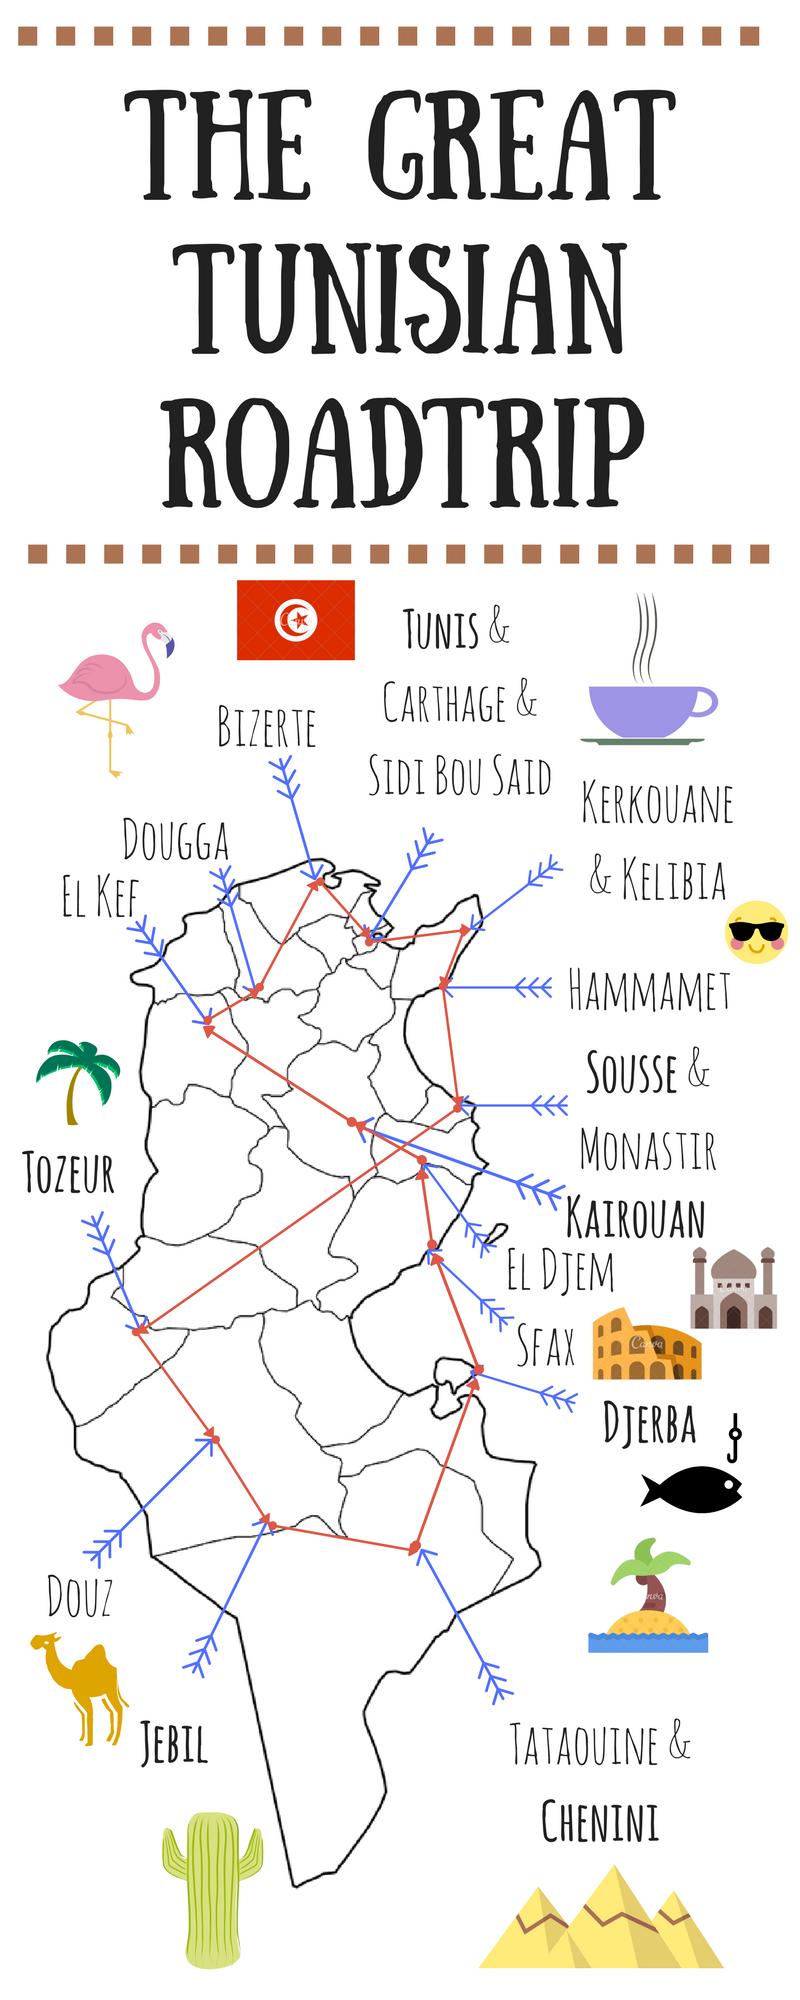 Tunisia | ~Tunisian Culture~ | Pinterest | Reisen, Tunesien und The road